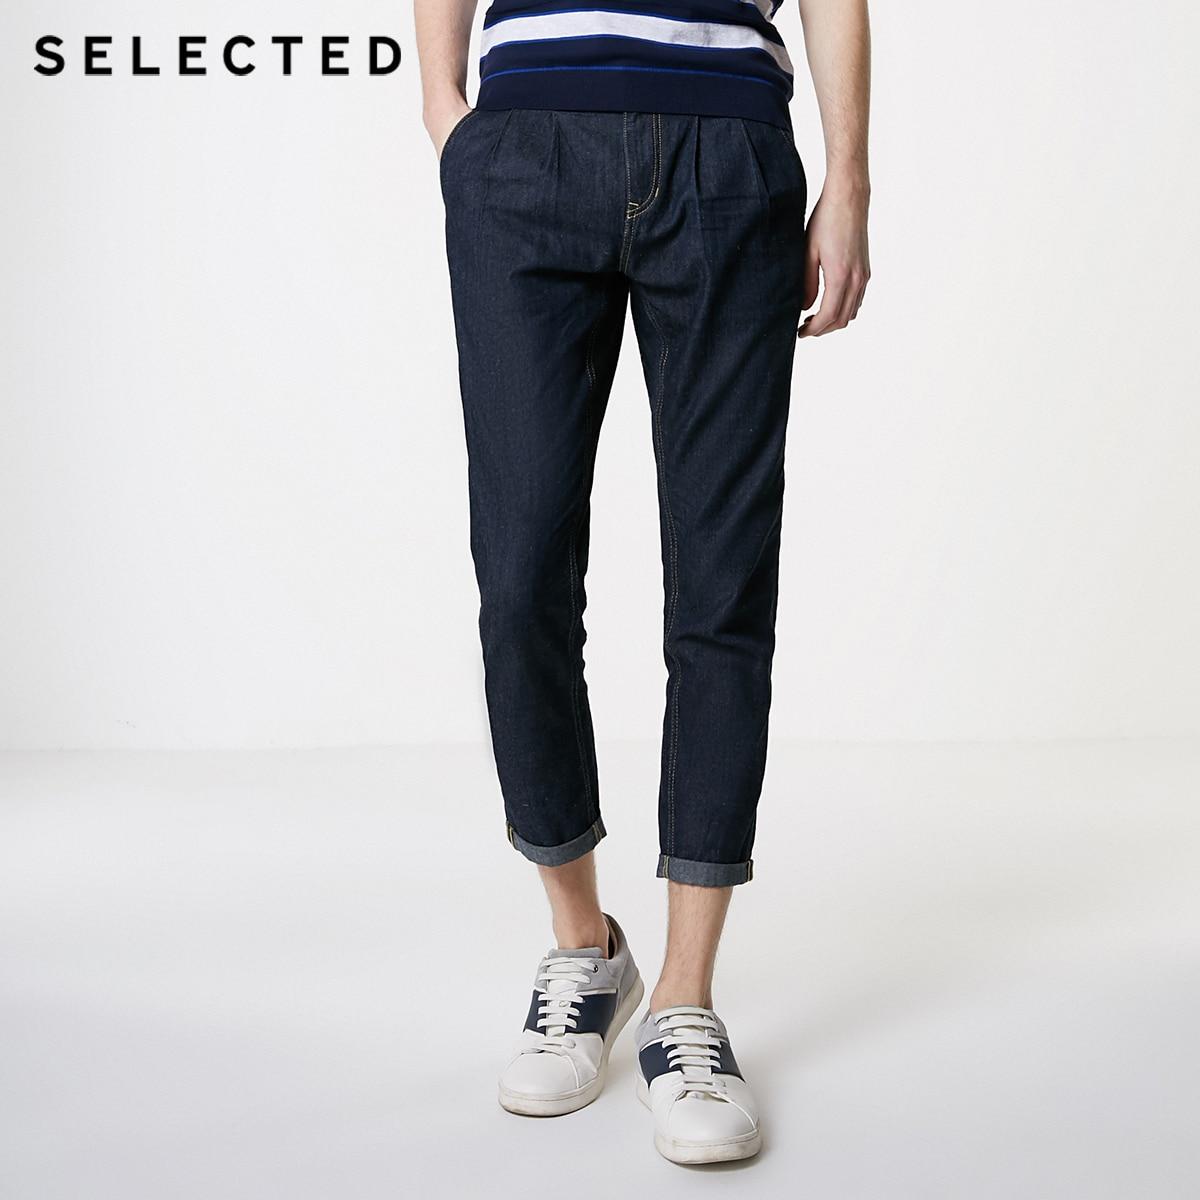 SELECTED Men's Summer Loose Fit Denim Pants Cotton And Linen Blended Crop Jeans C|419232513